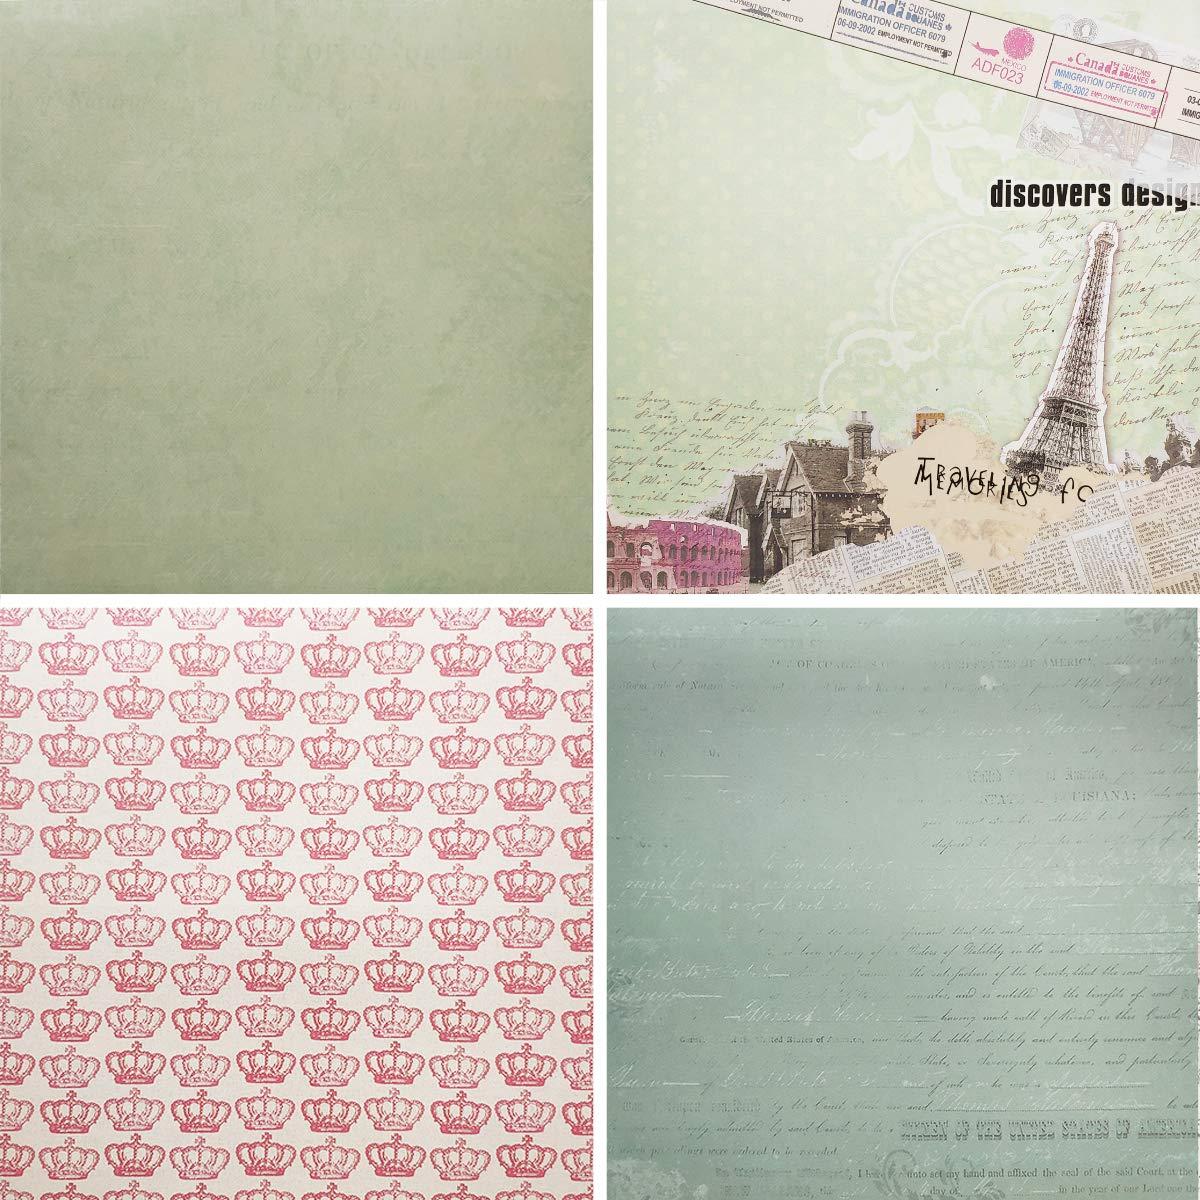 005 40 Sheets) levylisa 8x8 Cardstock Paper Pad Designer Paper Pad Floral Scrapbook Paper Decorative Craft Paper